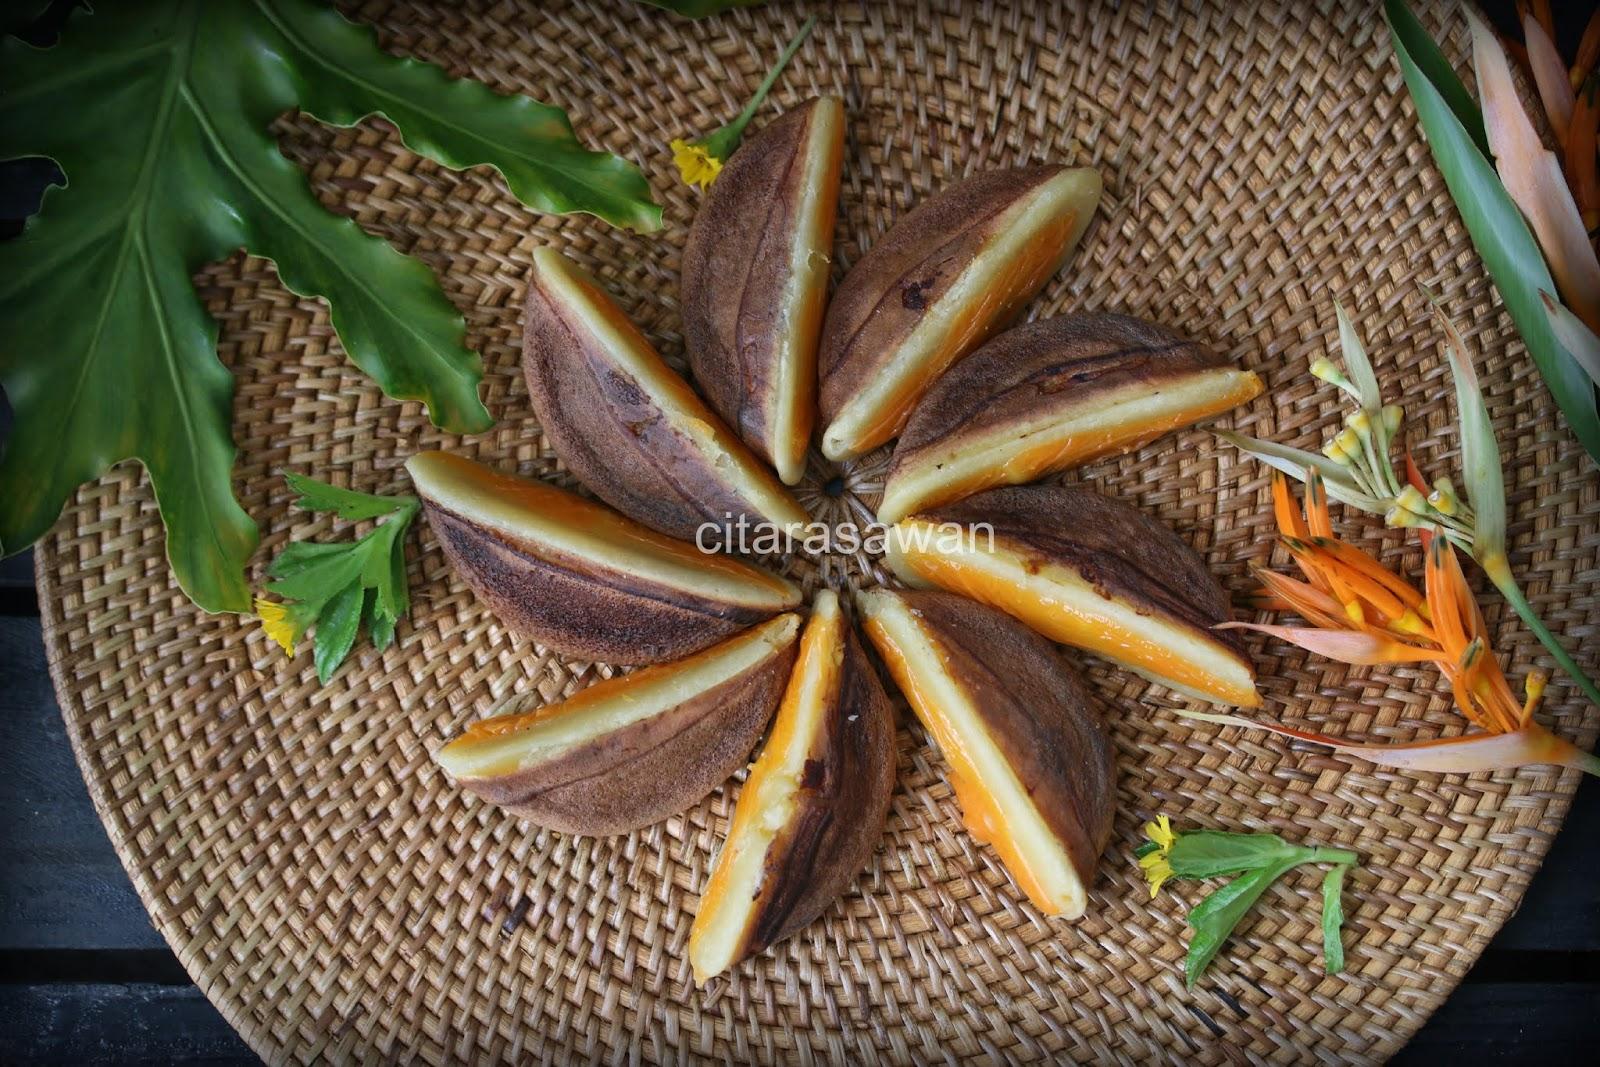 Kue Pukis Durian Resepi Terbaik